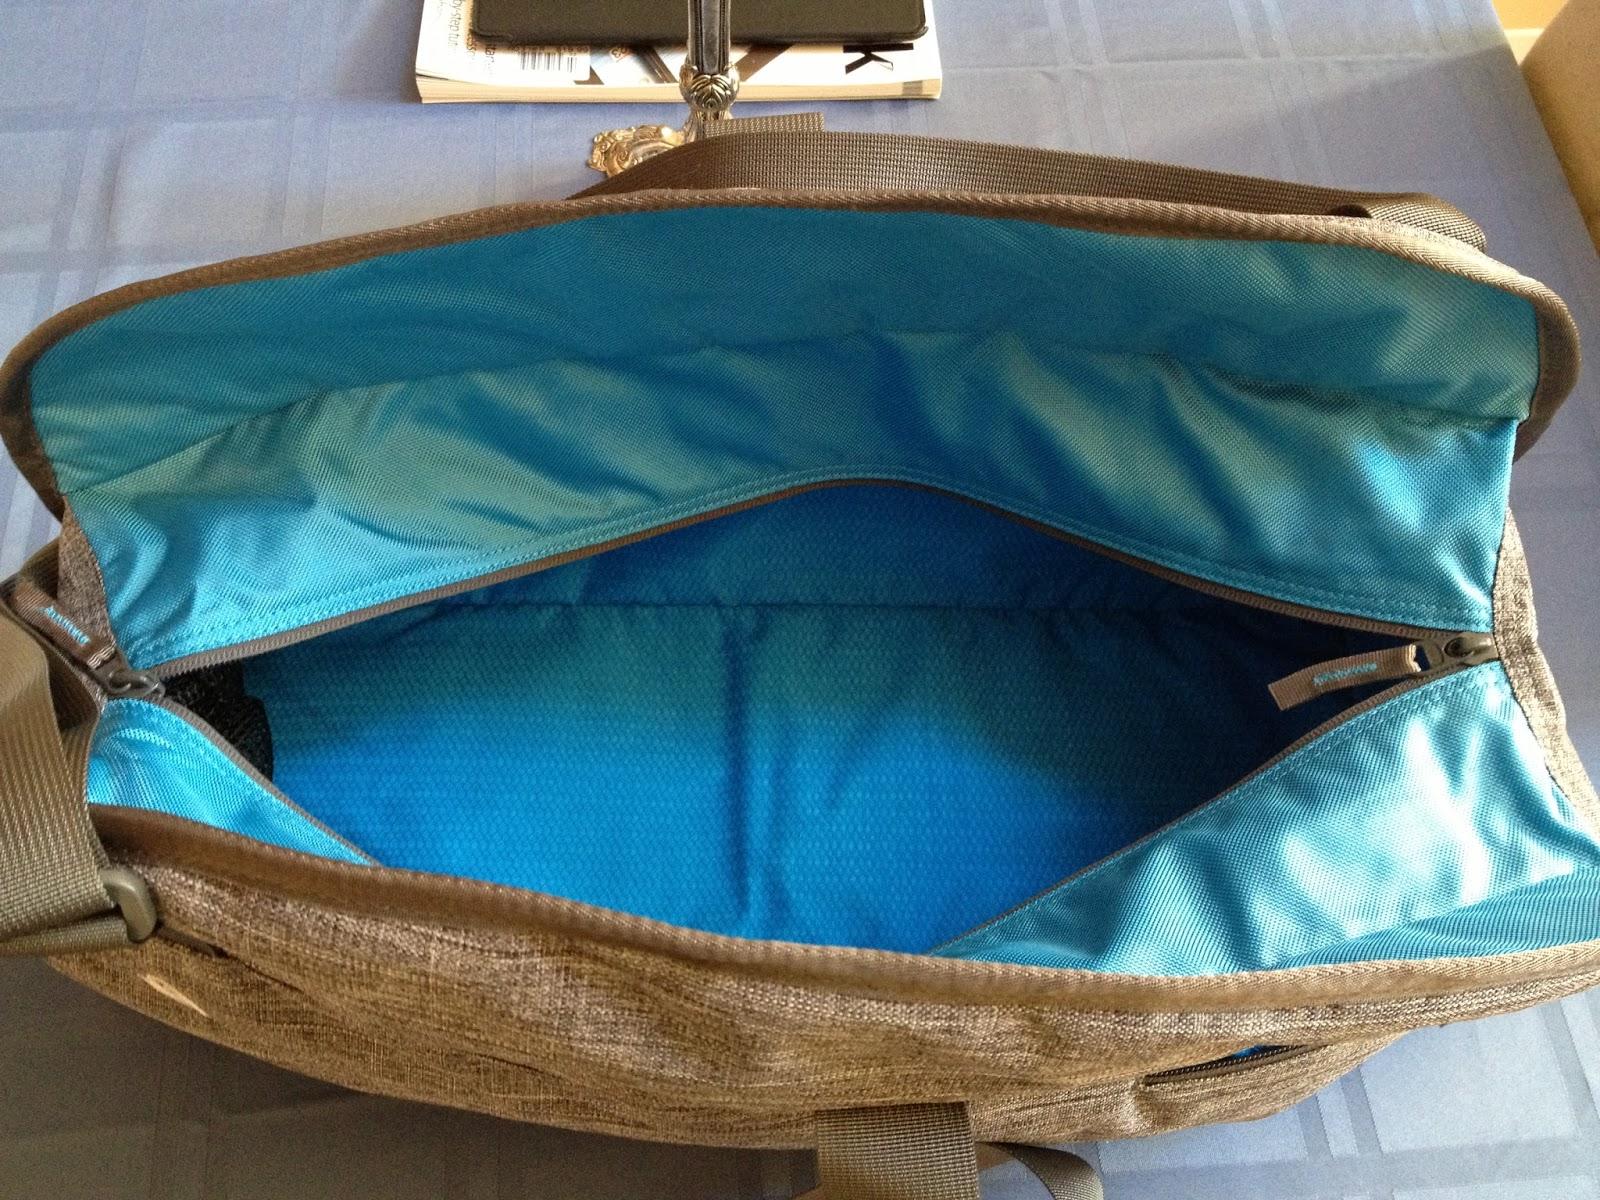 T2 Yoga Bag  A Product Review b56c8e439654d